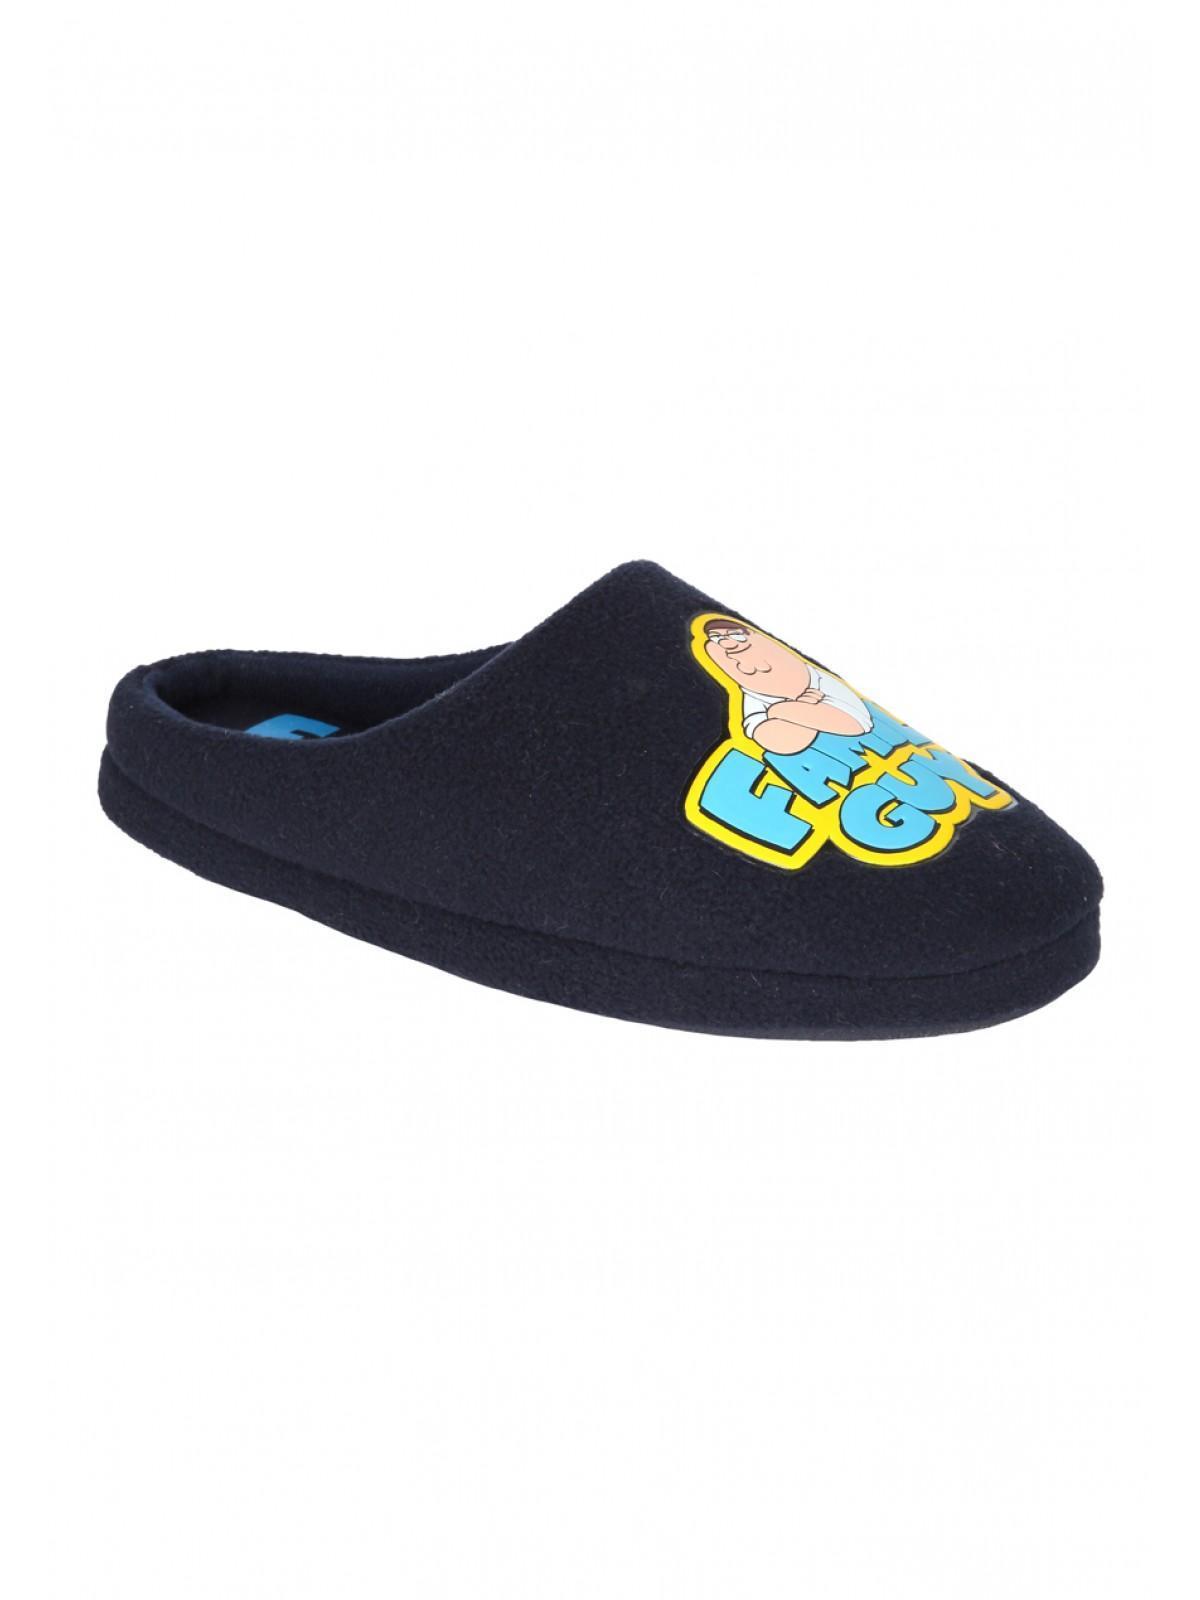 43a52504516e71 Home; Mens Family Guy Slippers. Back. PreviousNext